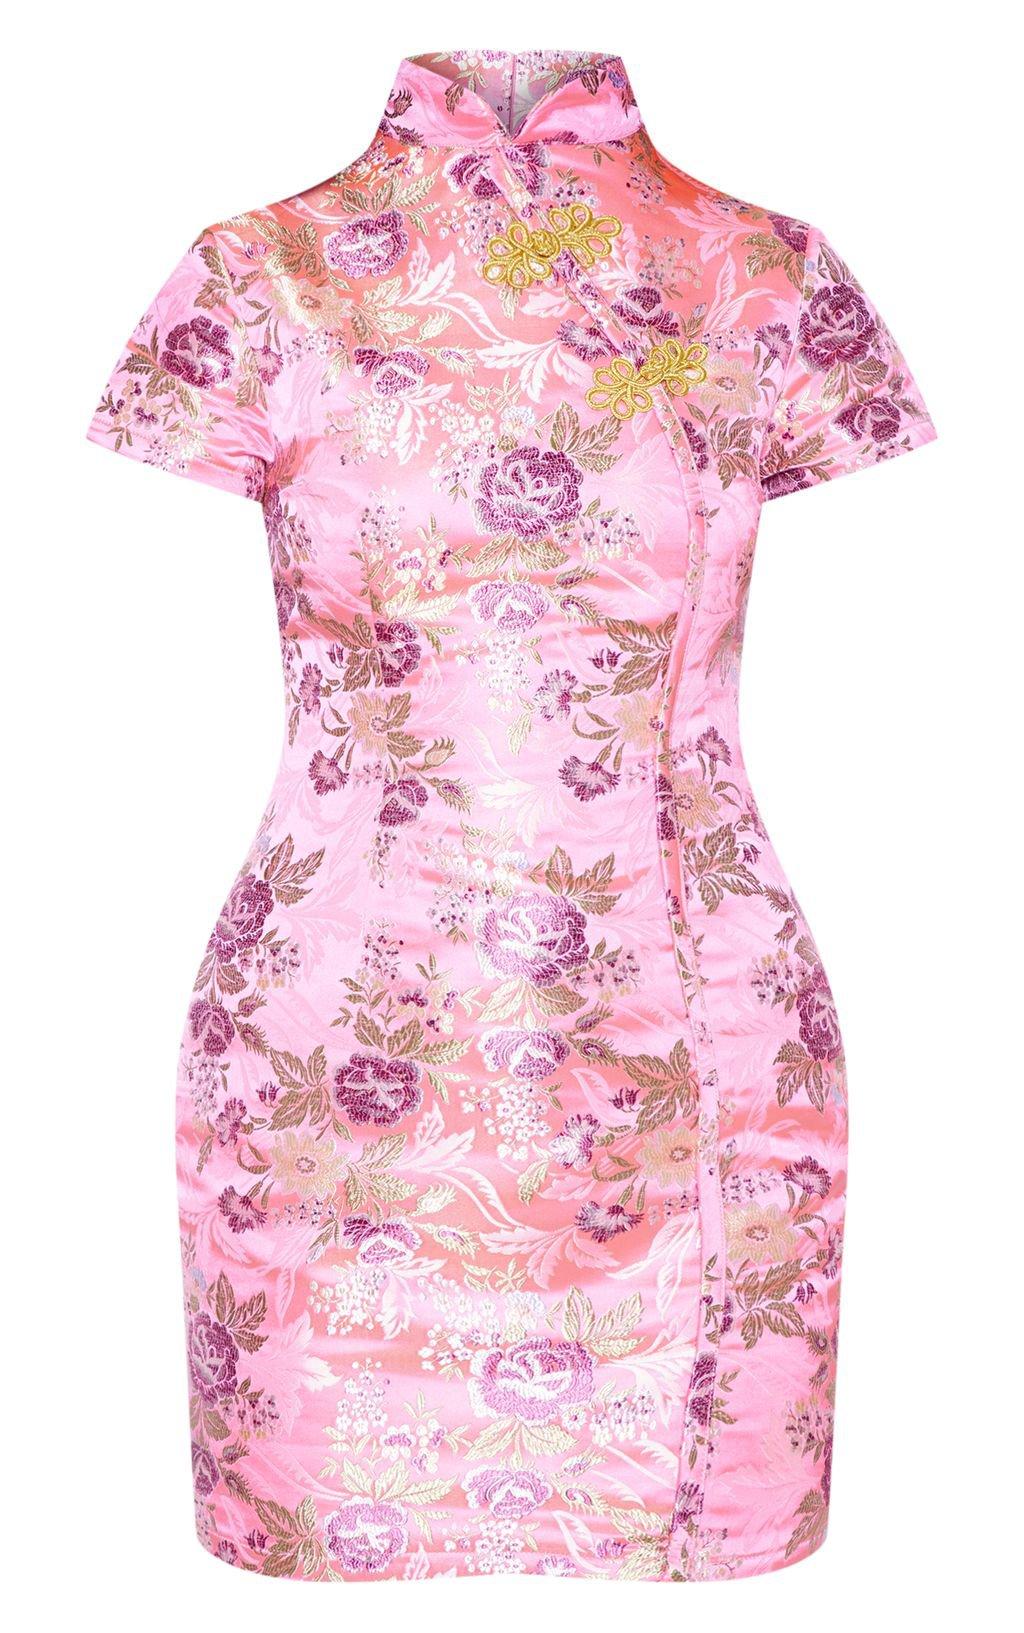 Pink Oriental Jacquard Bodycon Dress | PrettyLittleThing USA